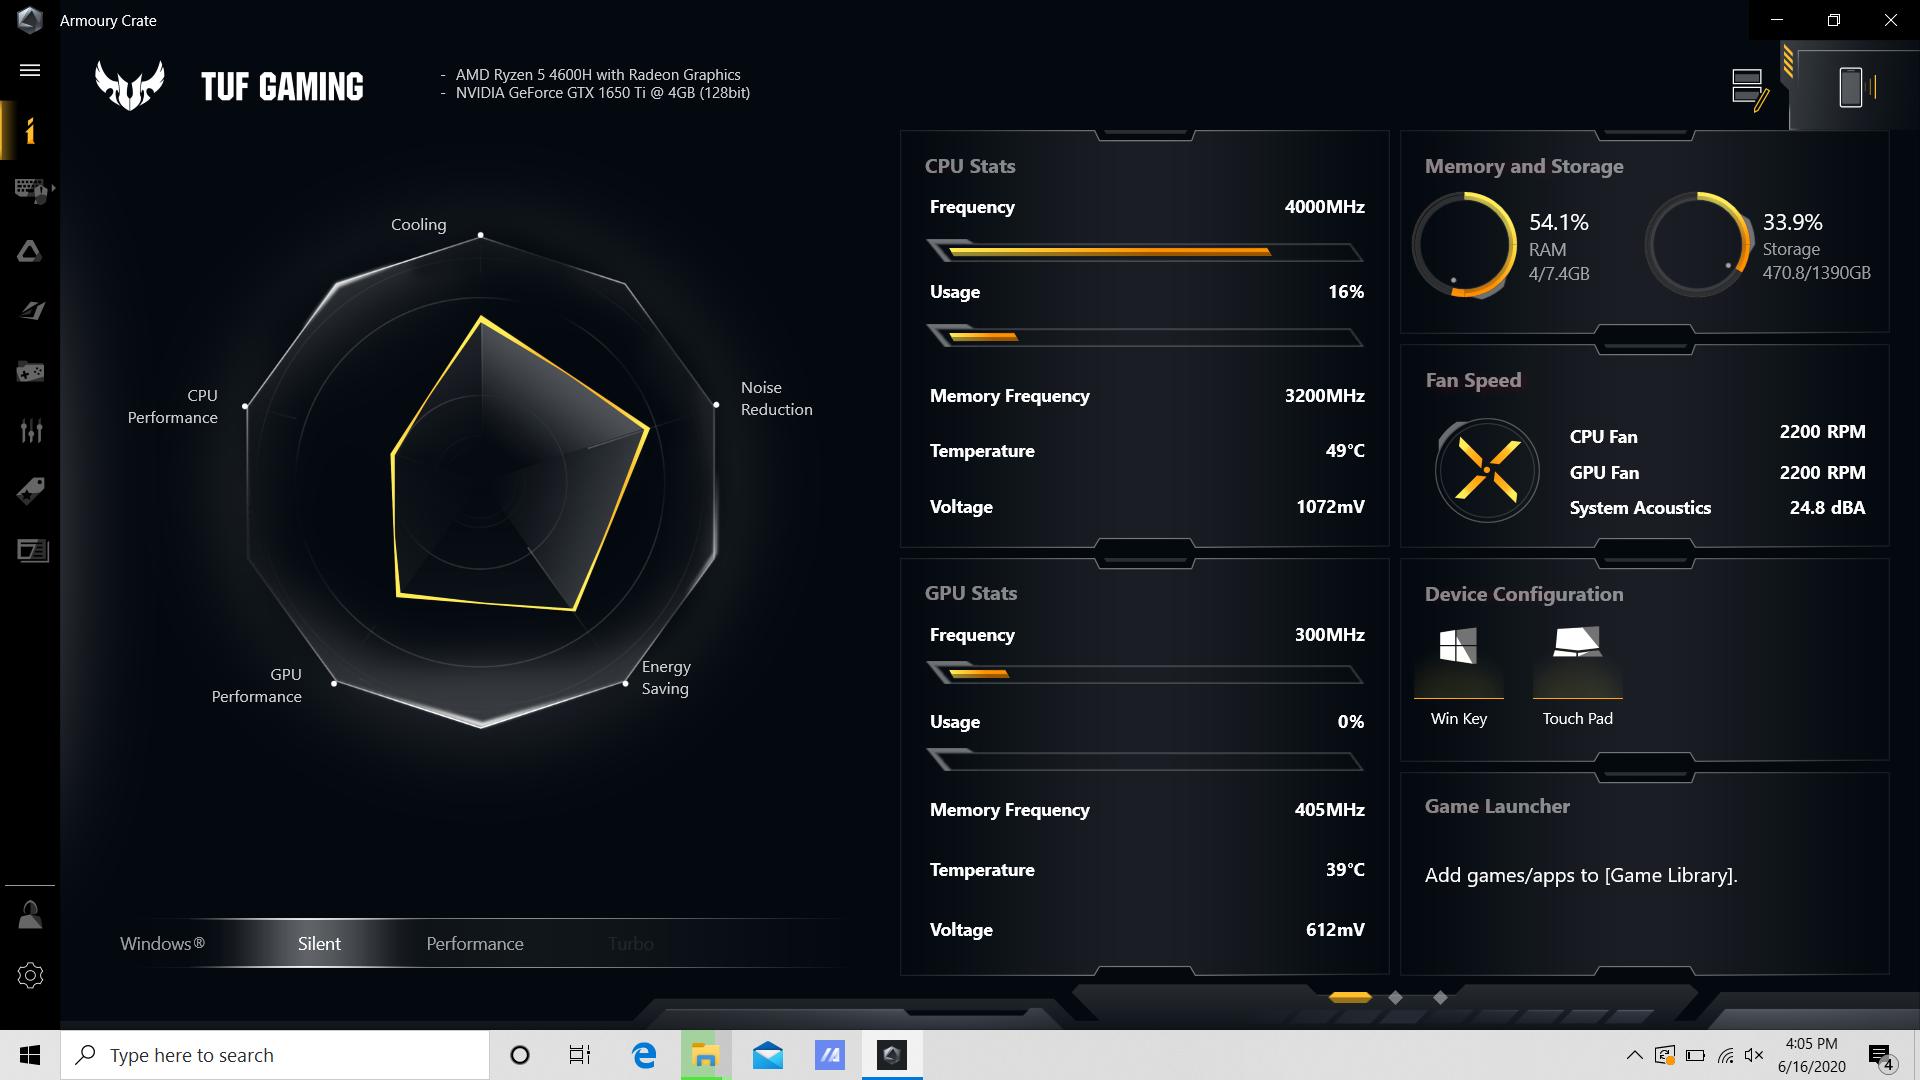 screenshot-1-png.10829